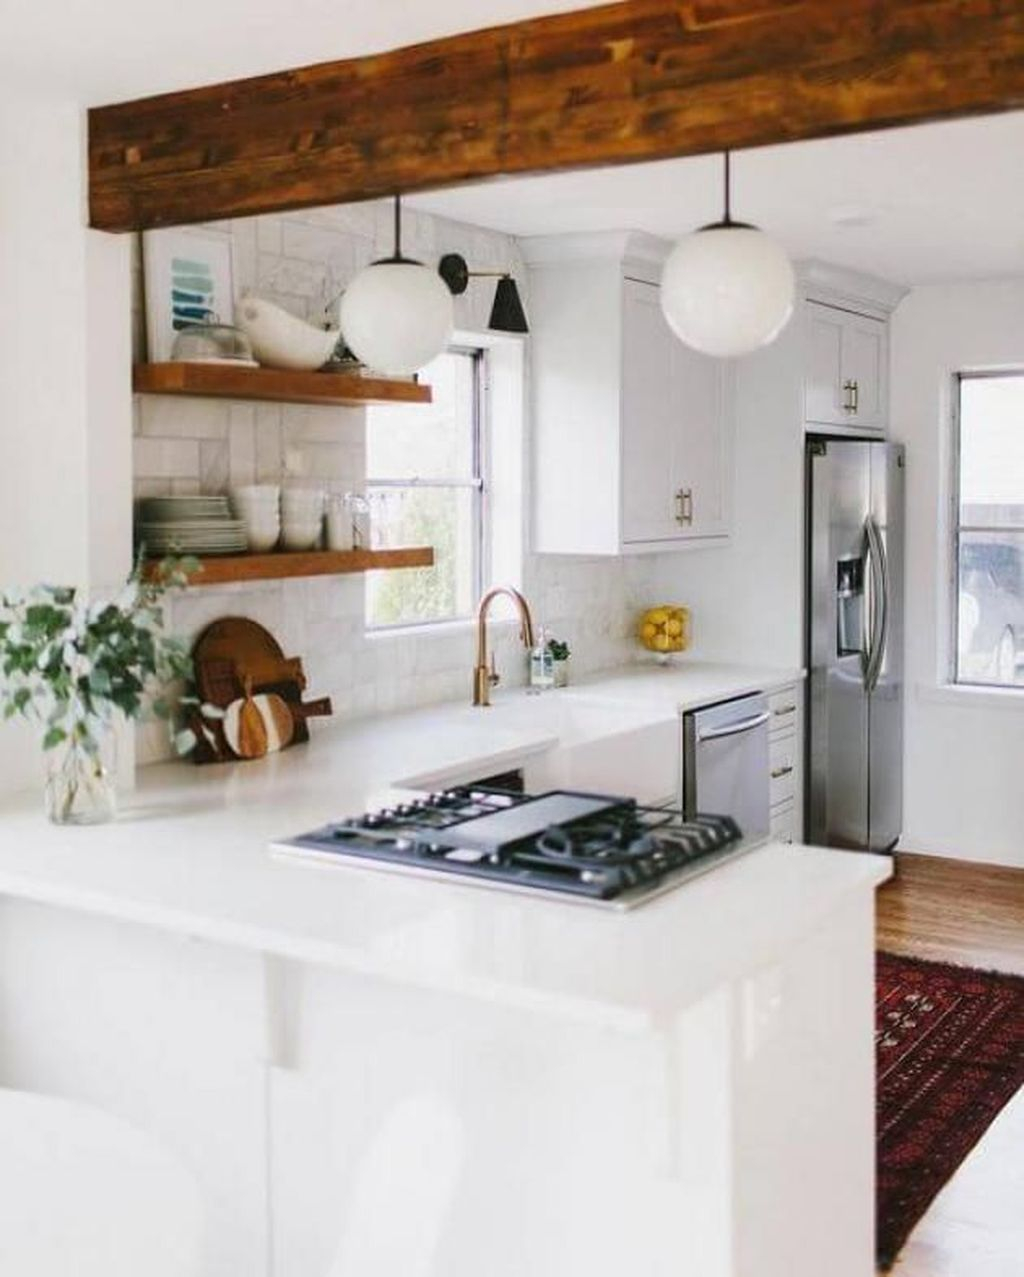 Brilliant Small Kitchen Remodel Design Ideas On A Budget 29